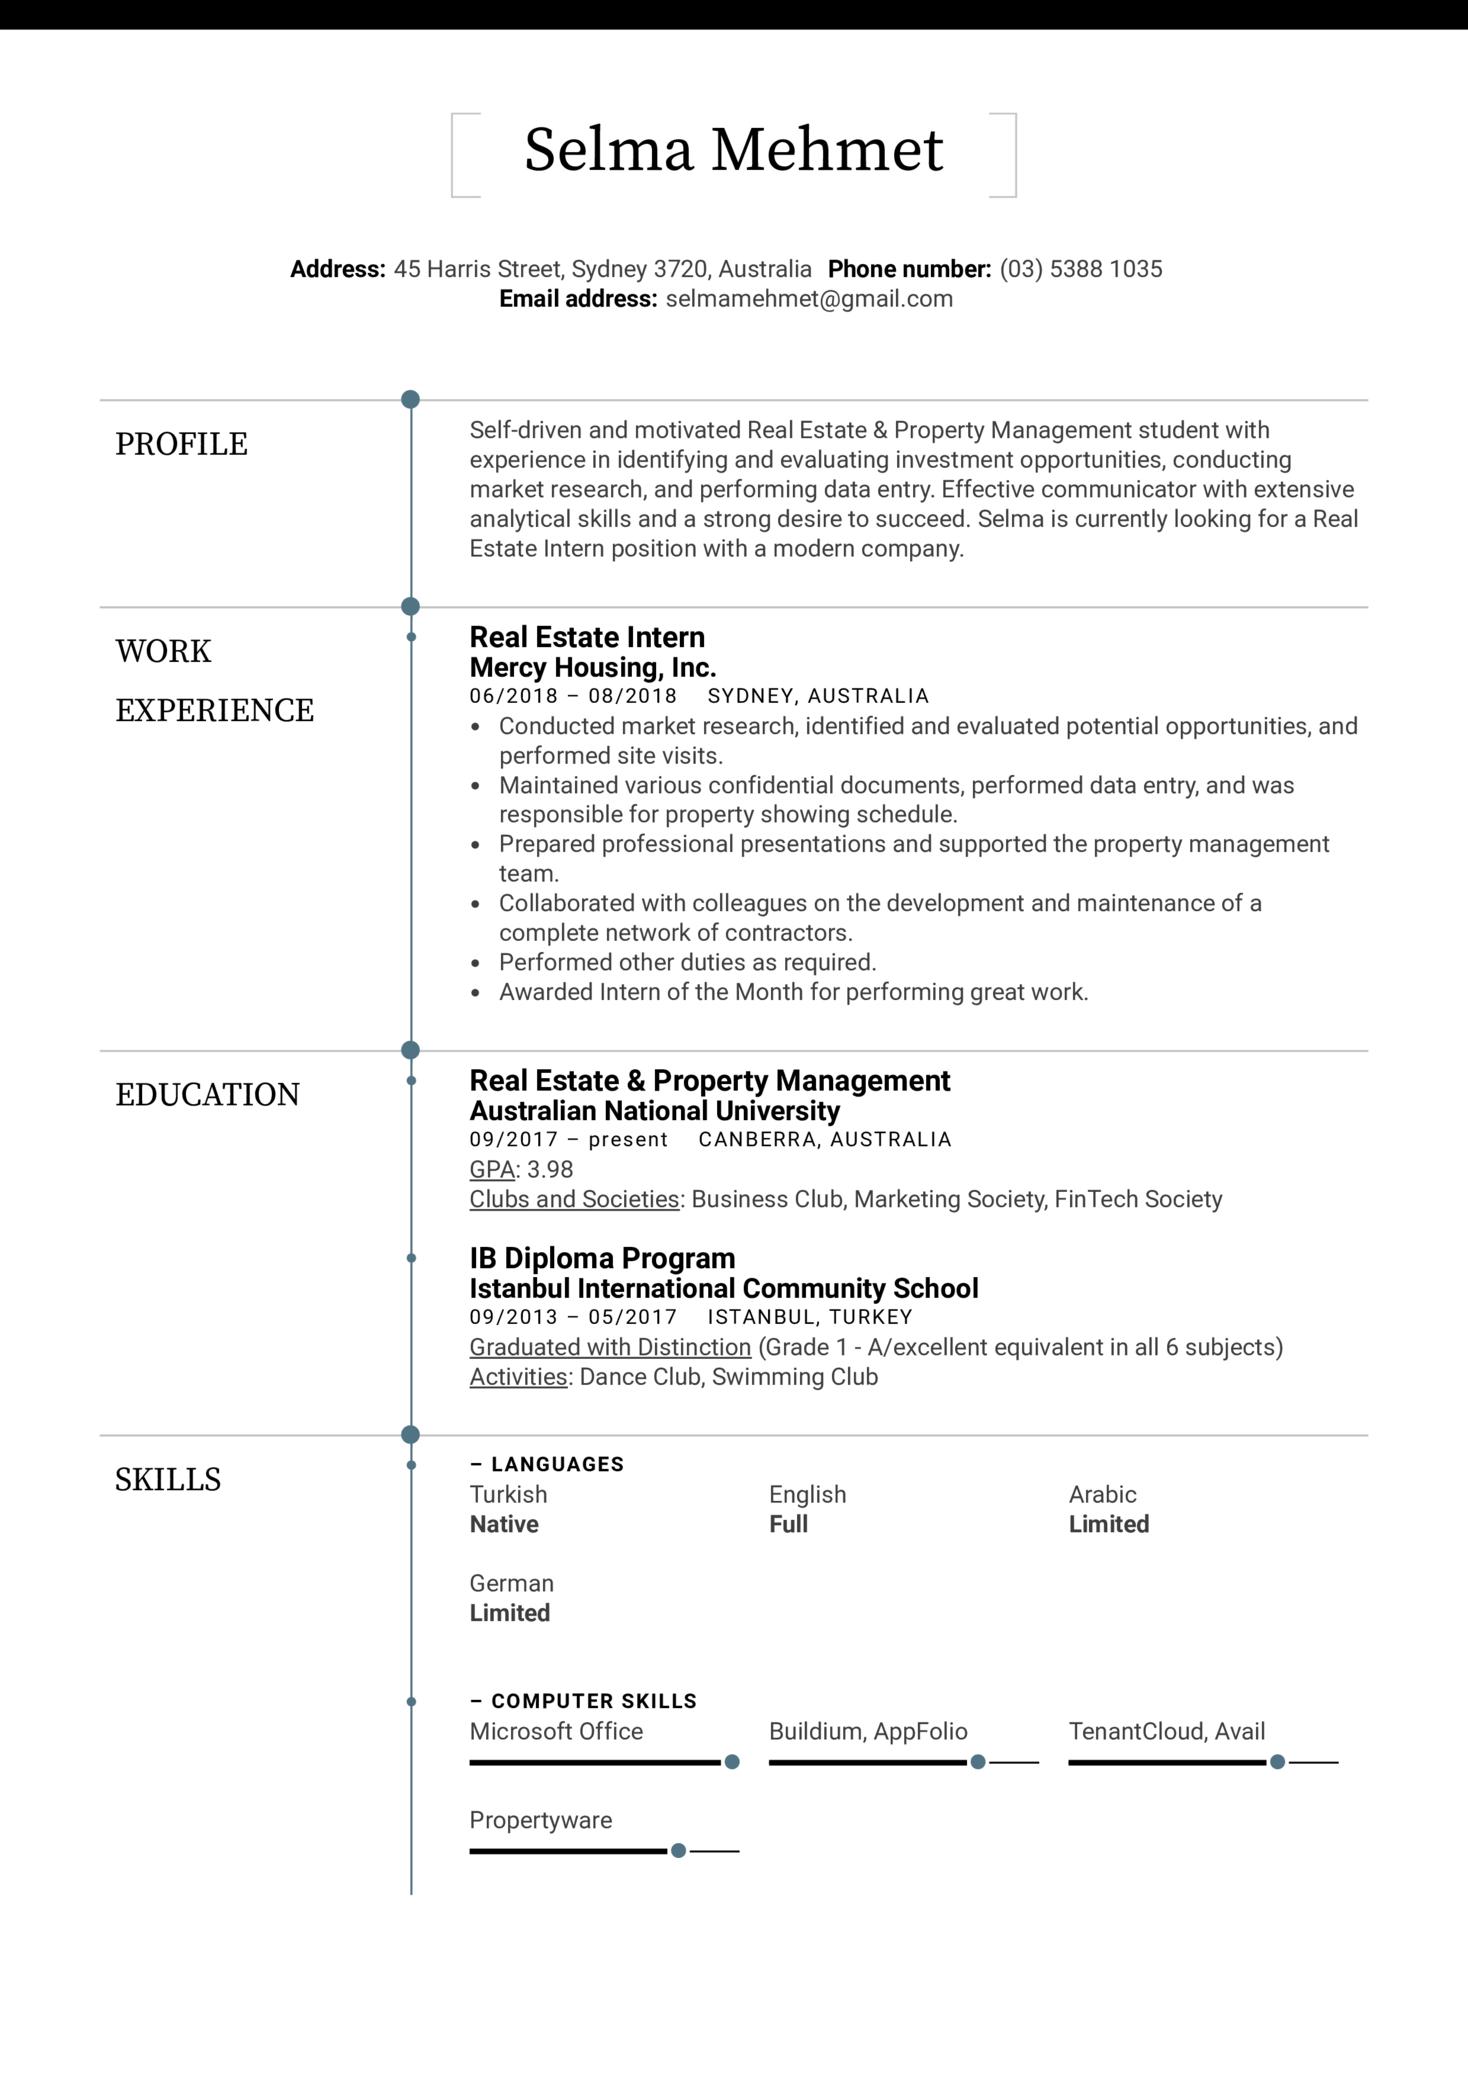 Real Estate Intern Resume Sample (Teil 1)